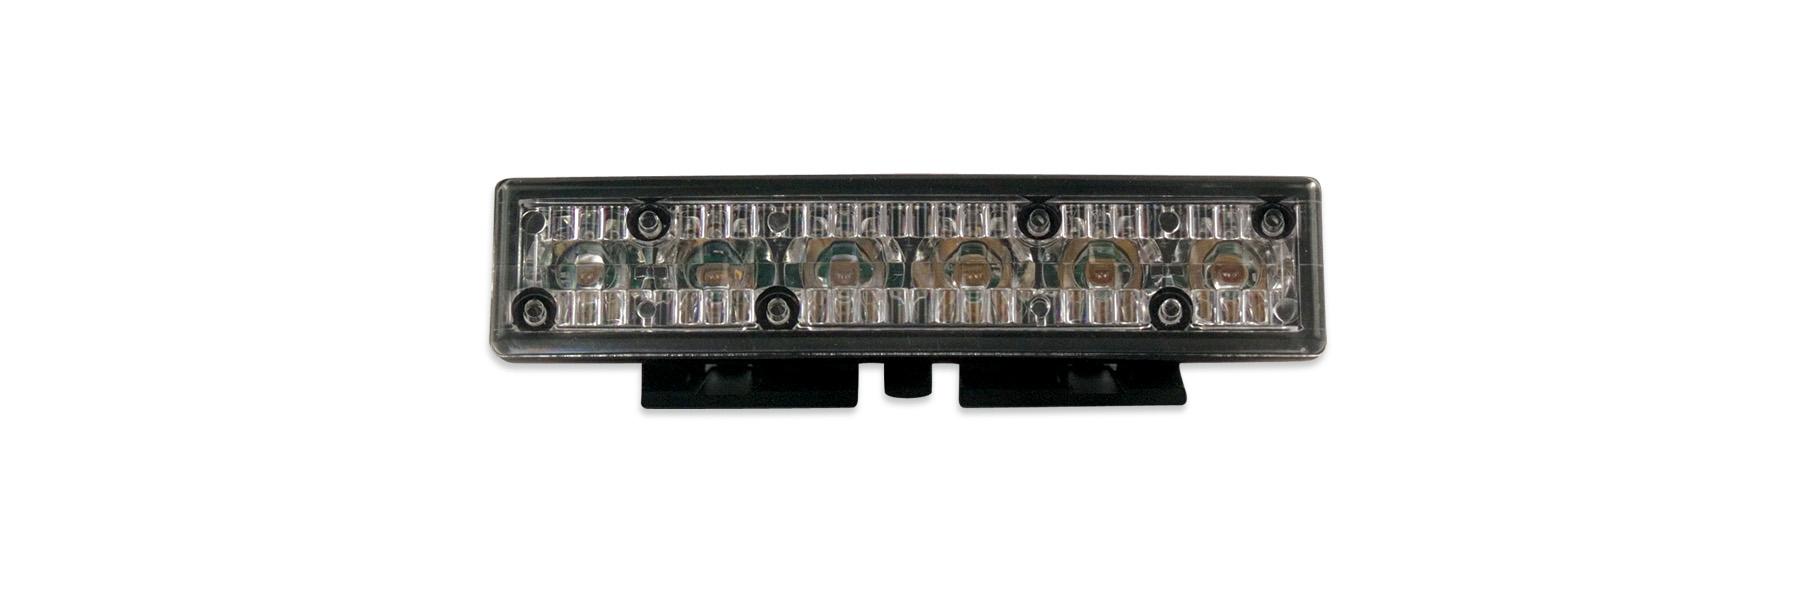 GHOST® LED Multi Mount Light Product Image